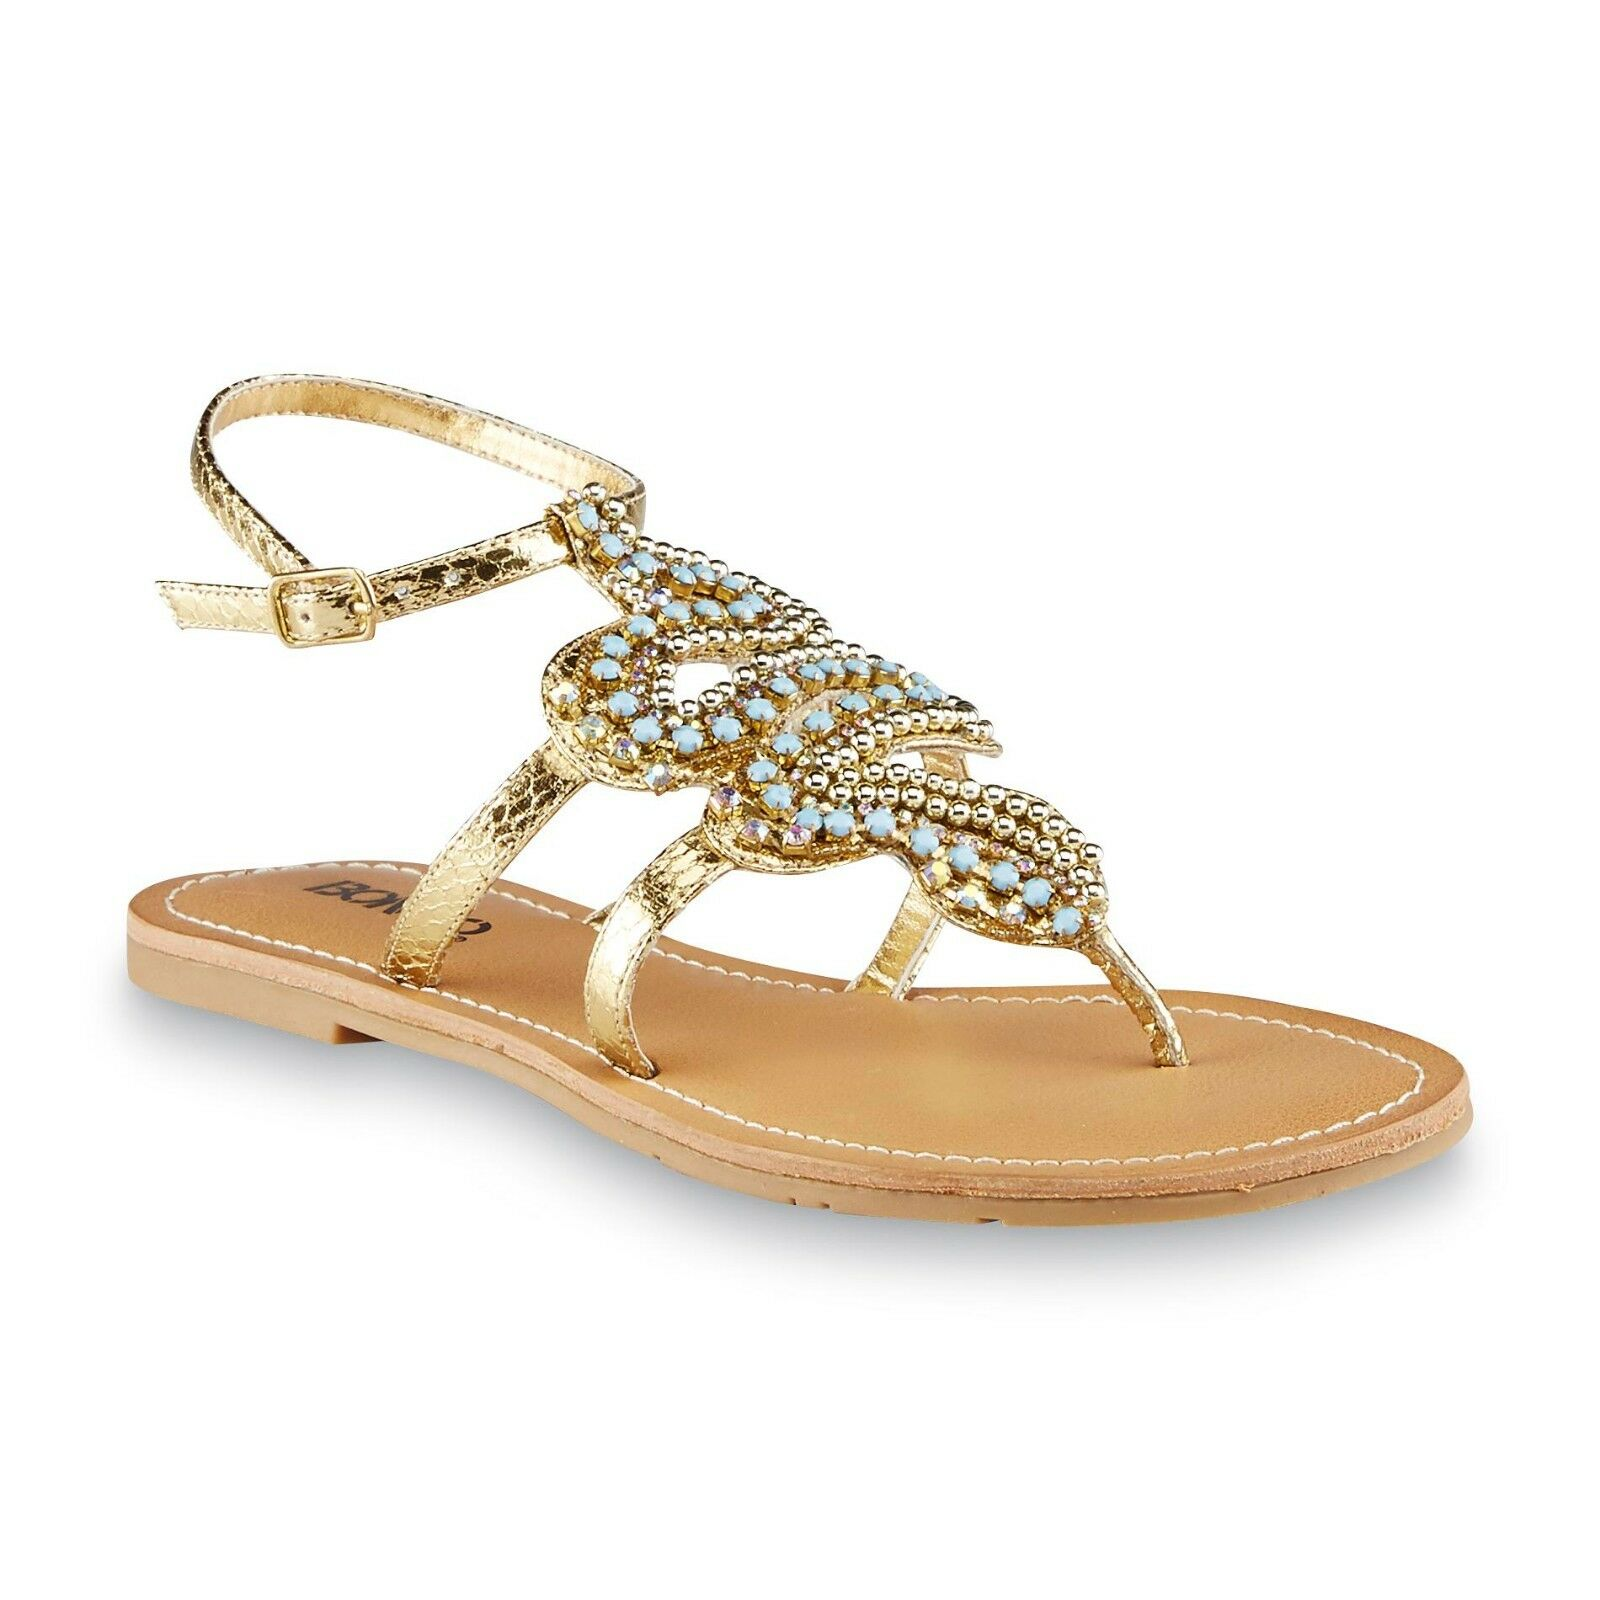 New Womens 4410 Bongo Exotic Shield Sandal Style 4410 Womens Gold 128J pr d9c4a1